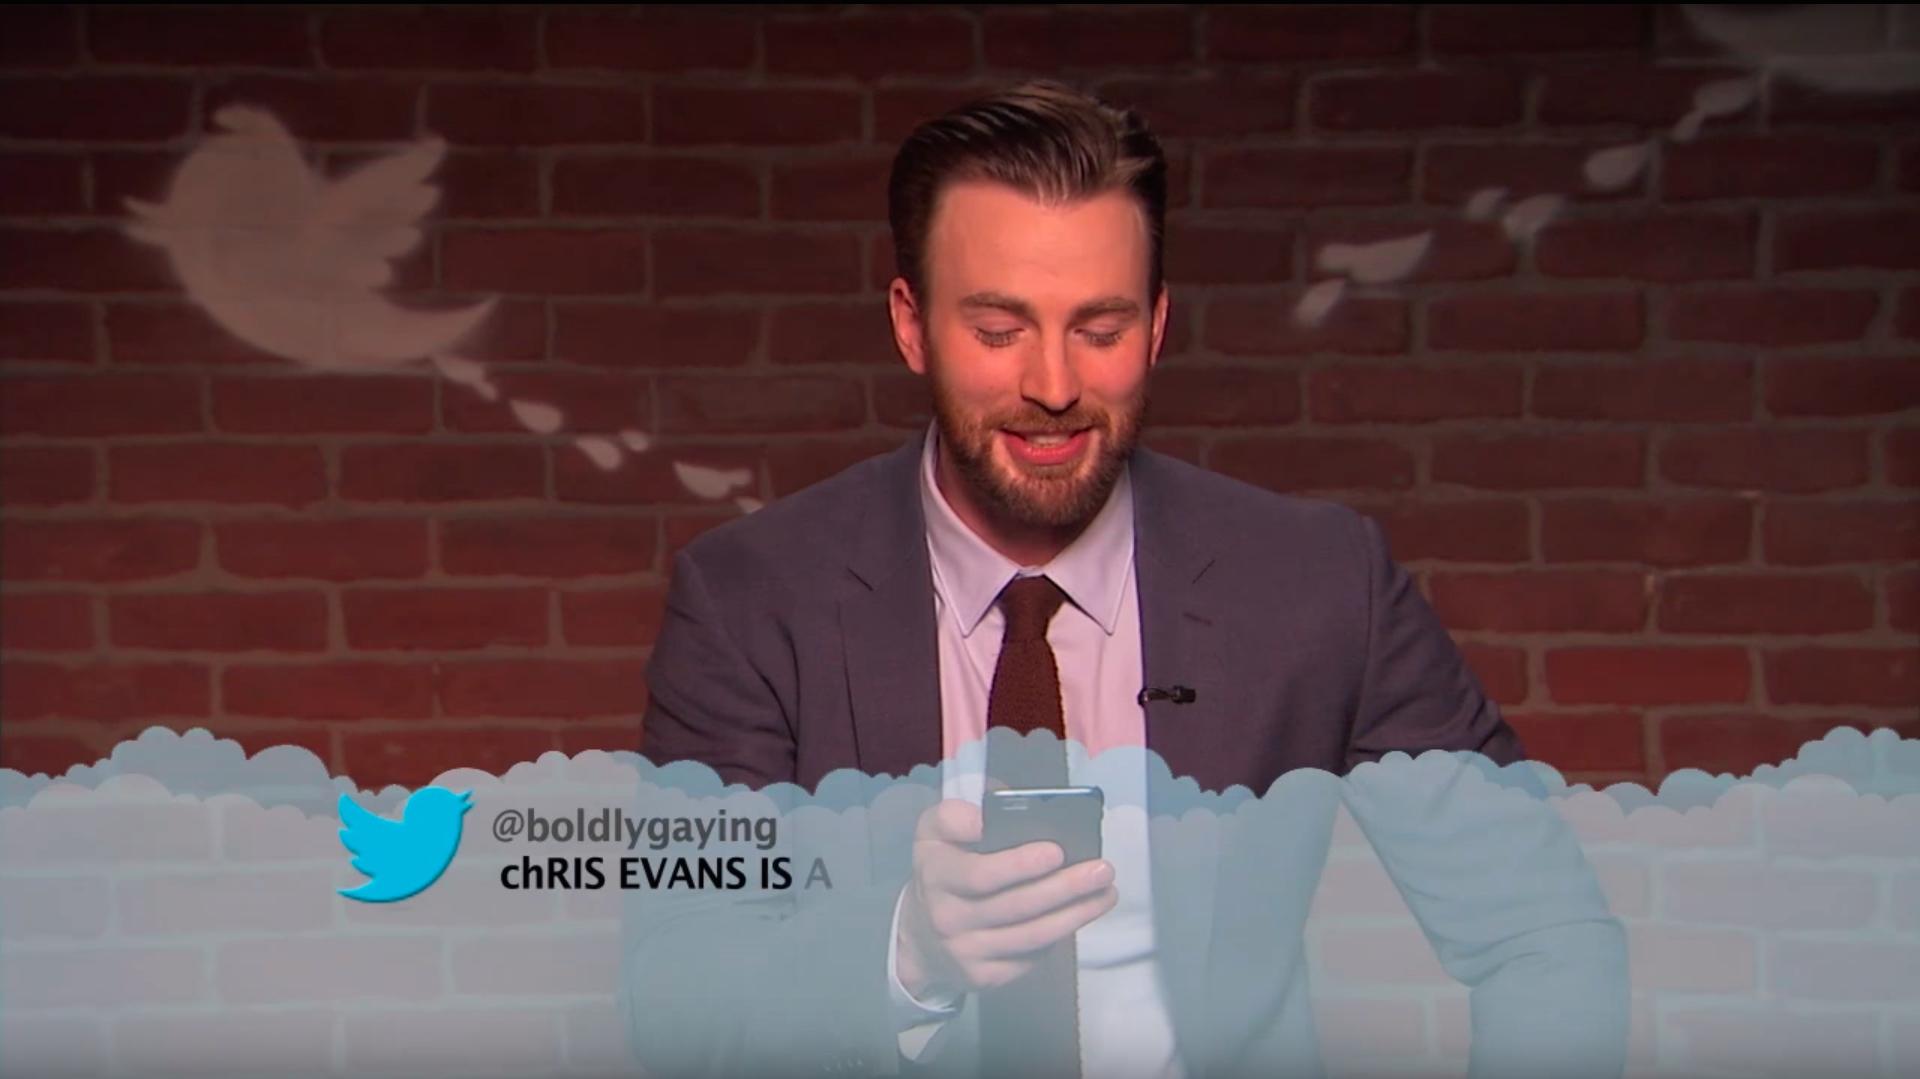 Chris Evans reads a mean tweet about himself.